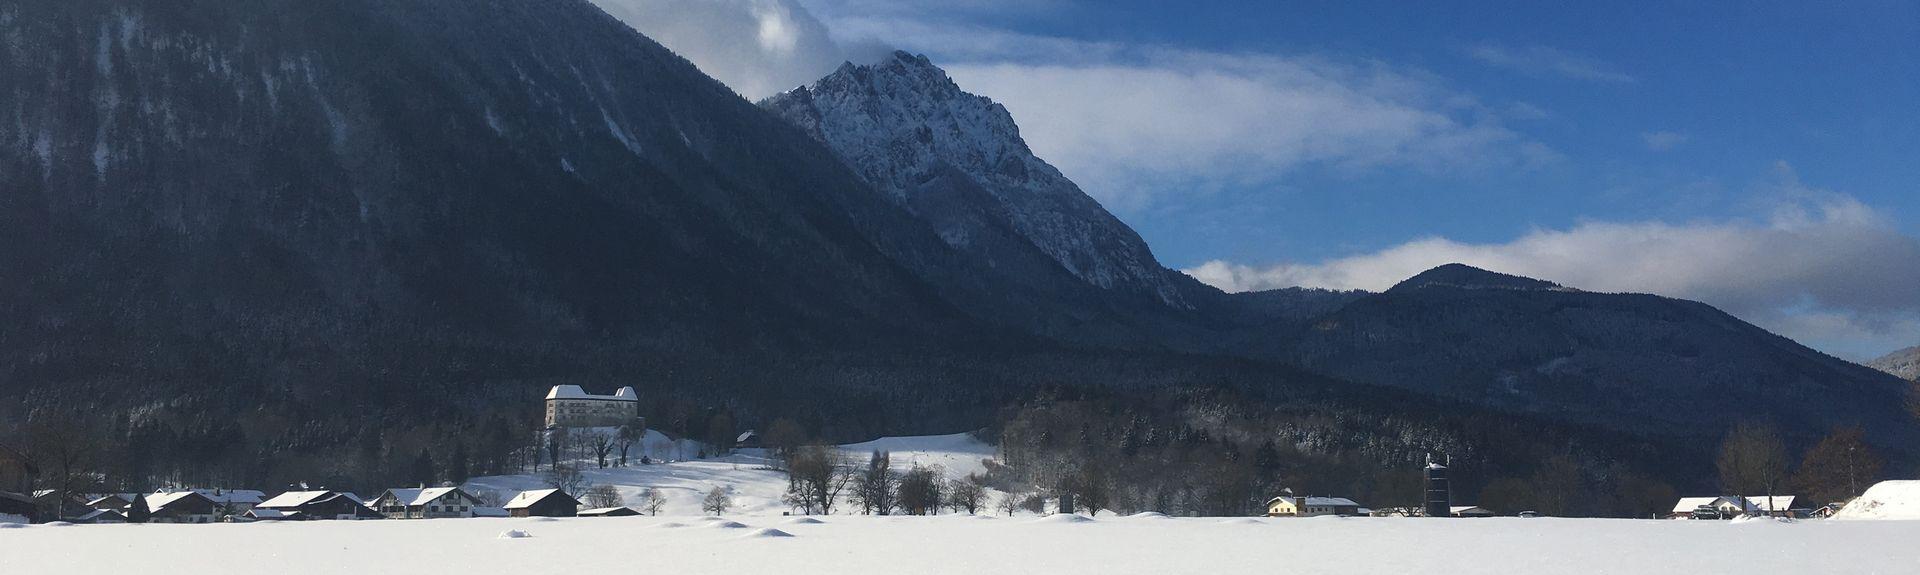 Hufschlagin asema, Surberg, Baijeri, Saksa